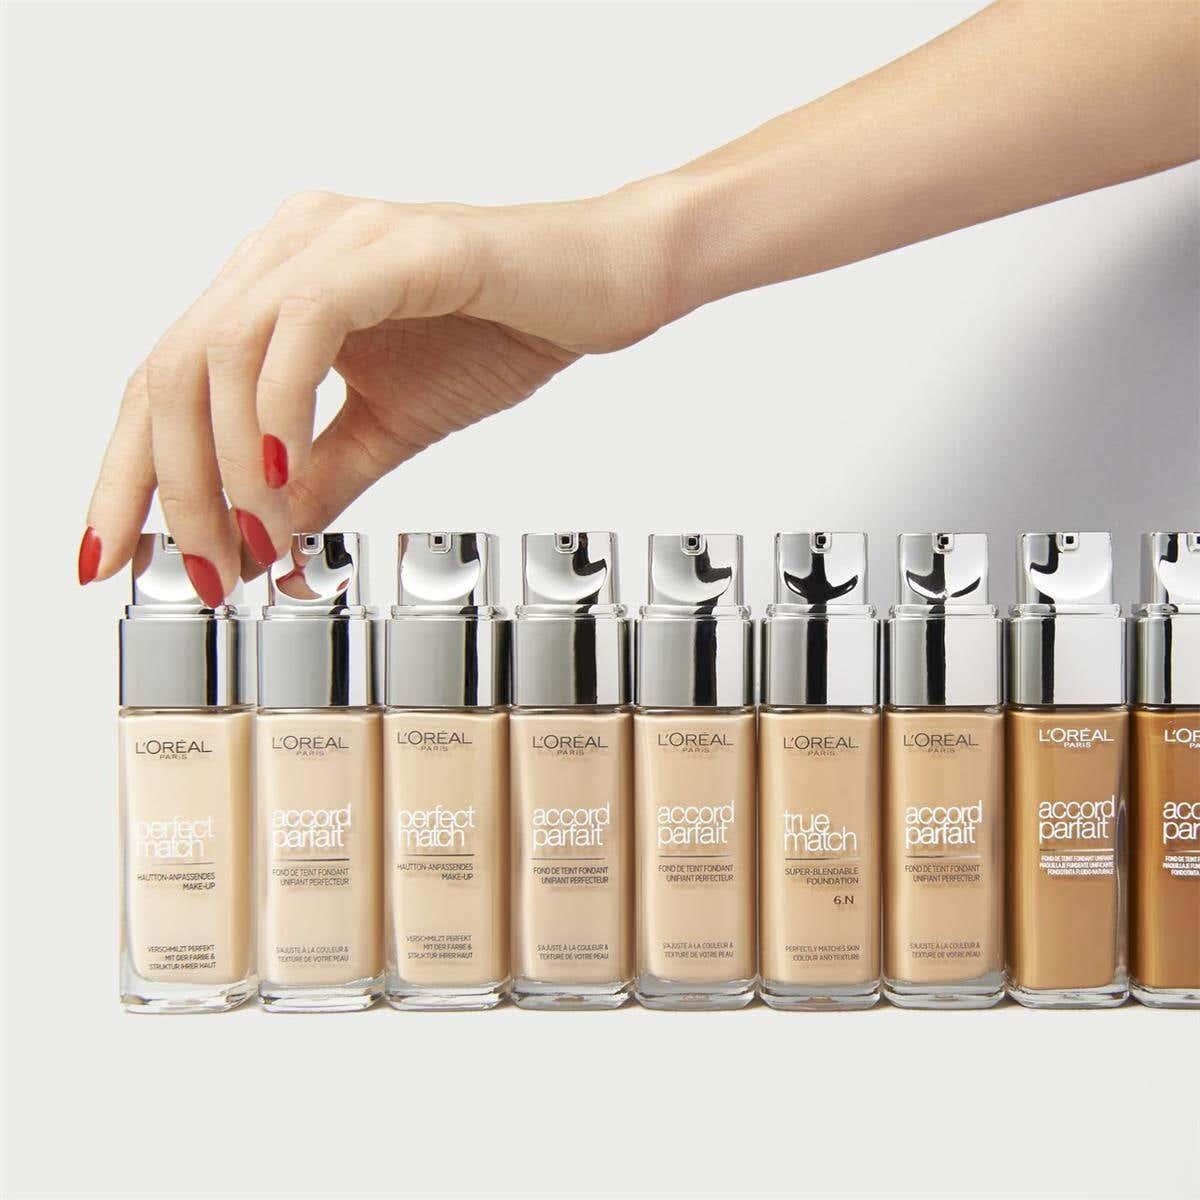 SaluteCosmetica - Fondotinta Accord Parfait di L'Oréal Paris